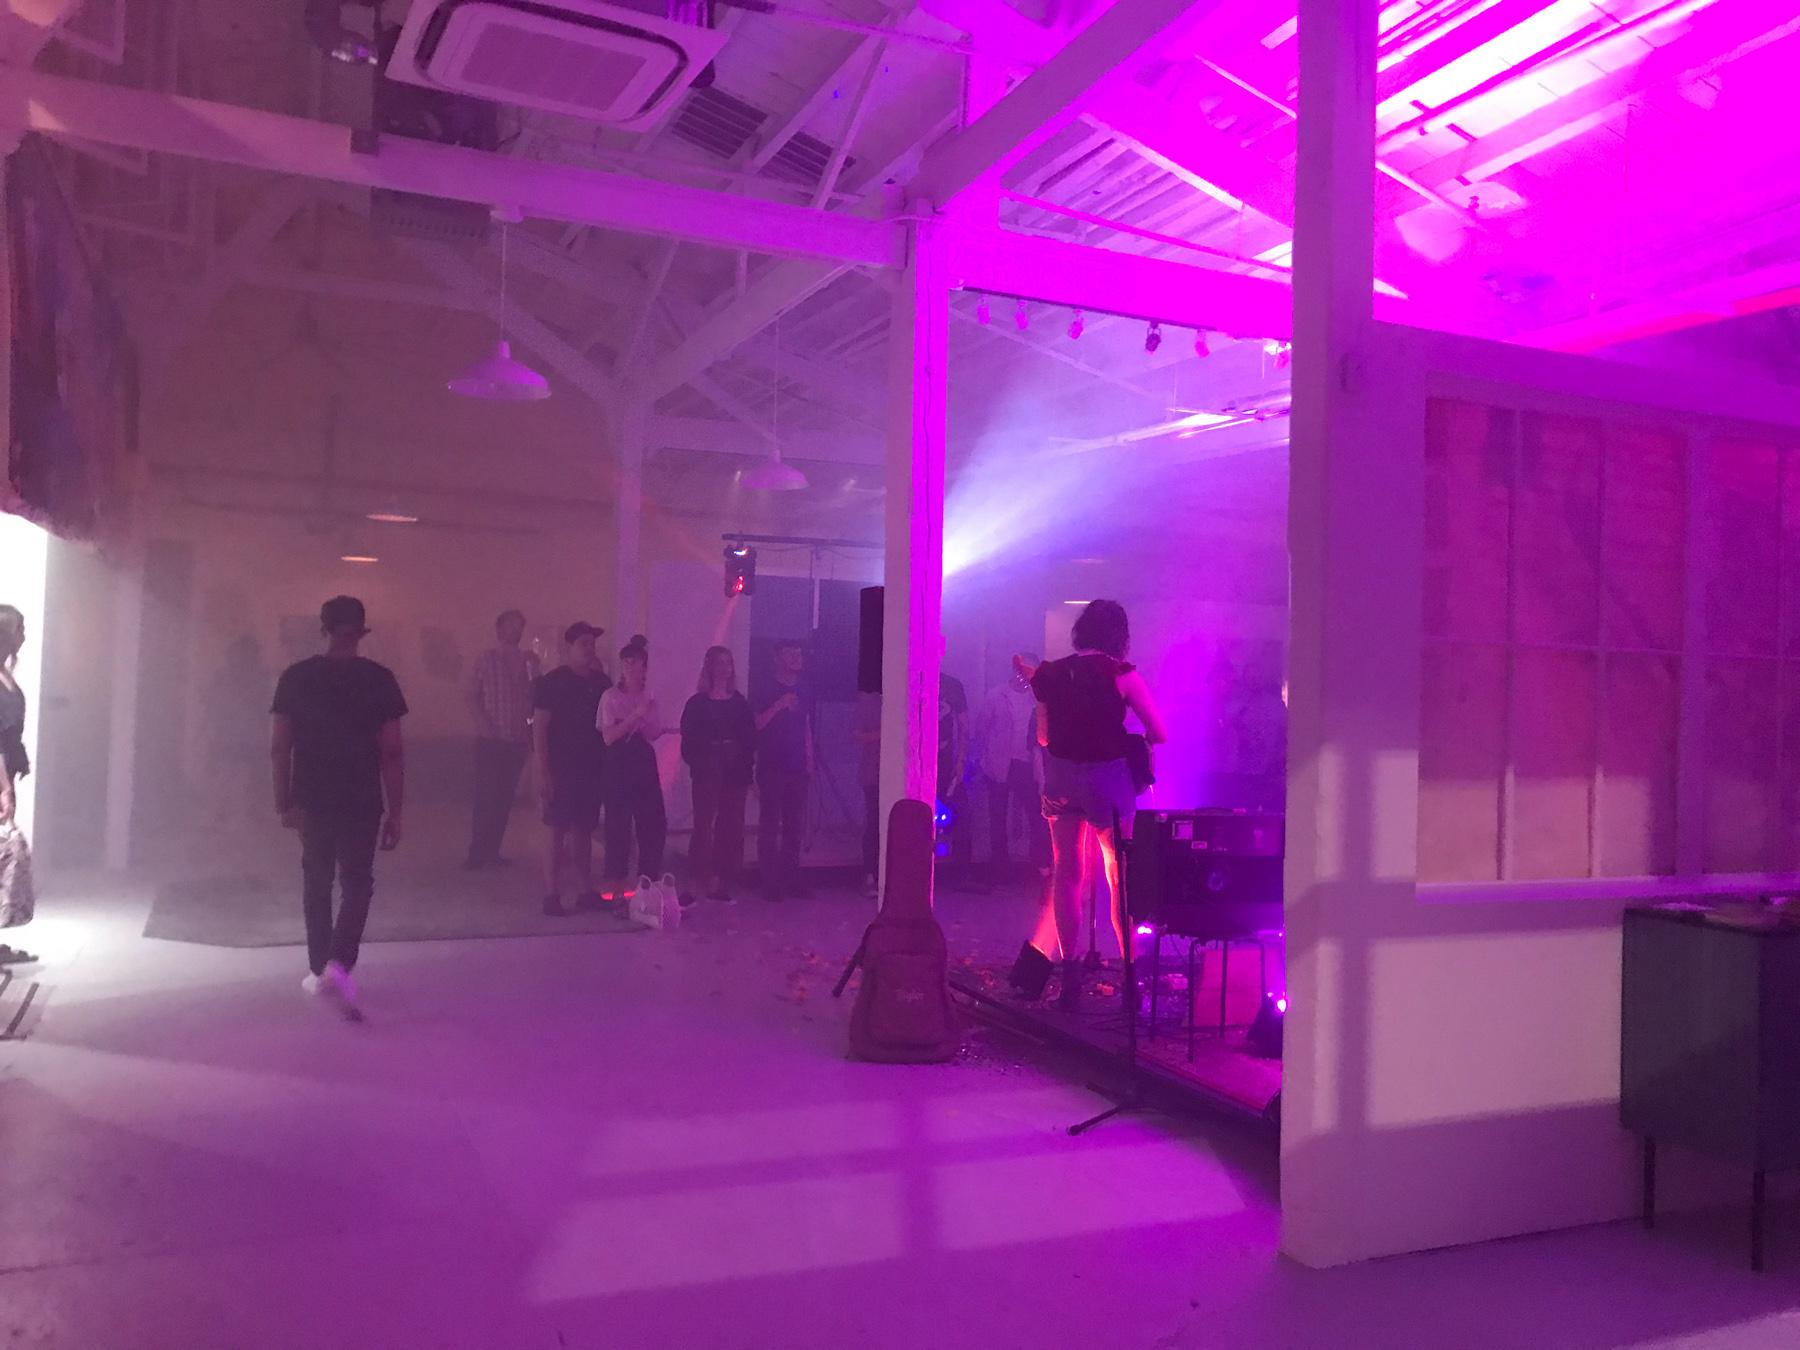 Cooler Gallery, New York 2018